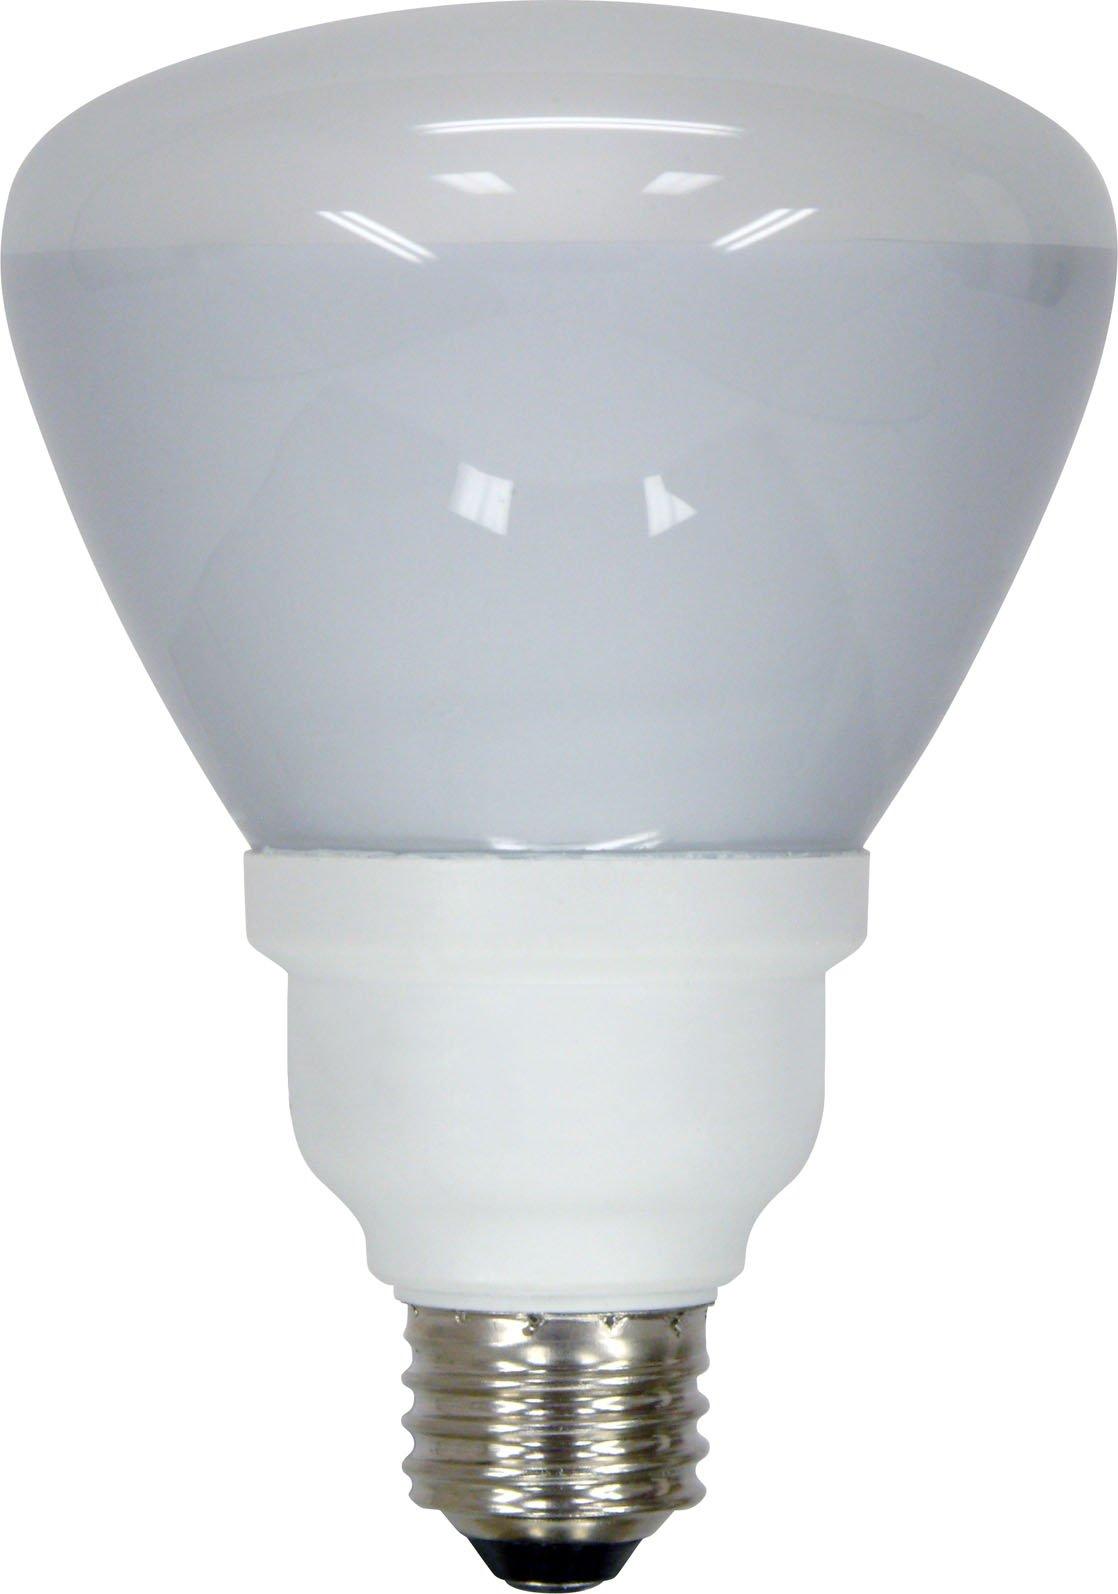 GE 21709 Energy Smart 15 Watt R30 Dimmable CFL Floodlight